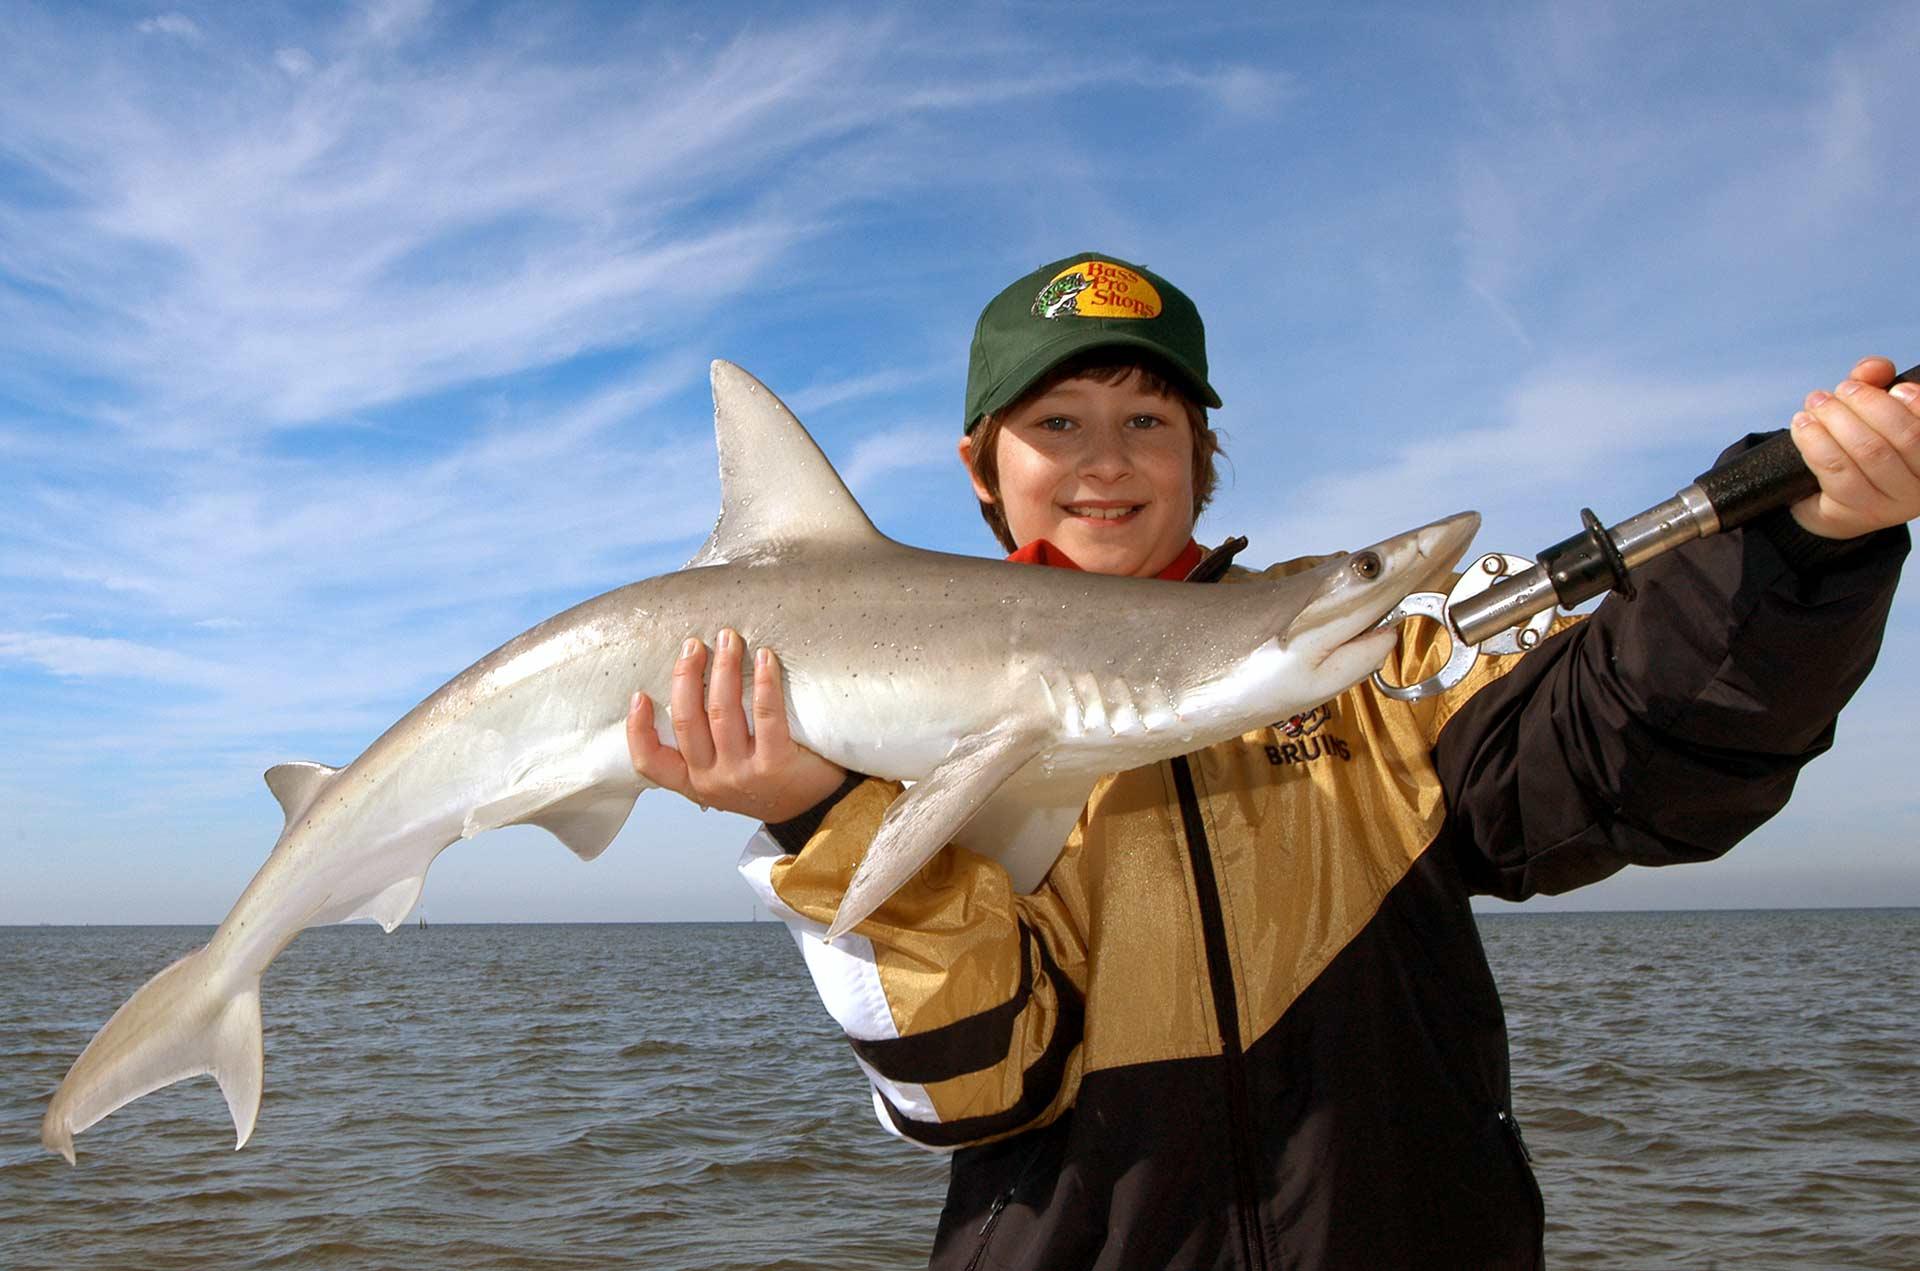 Tampa bay shark fishing afishionado guide services for Fishing tampa bay